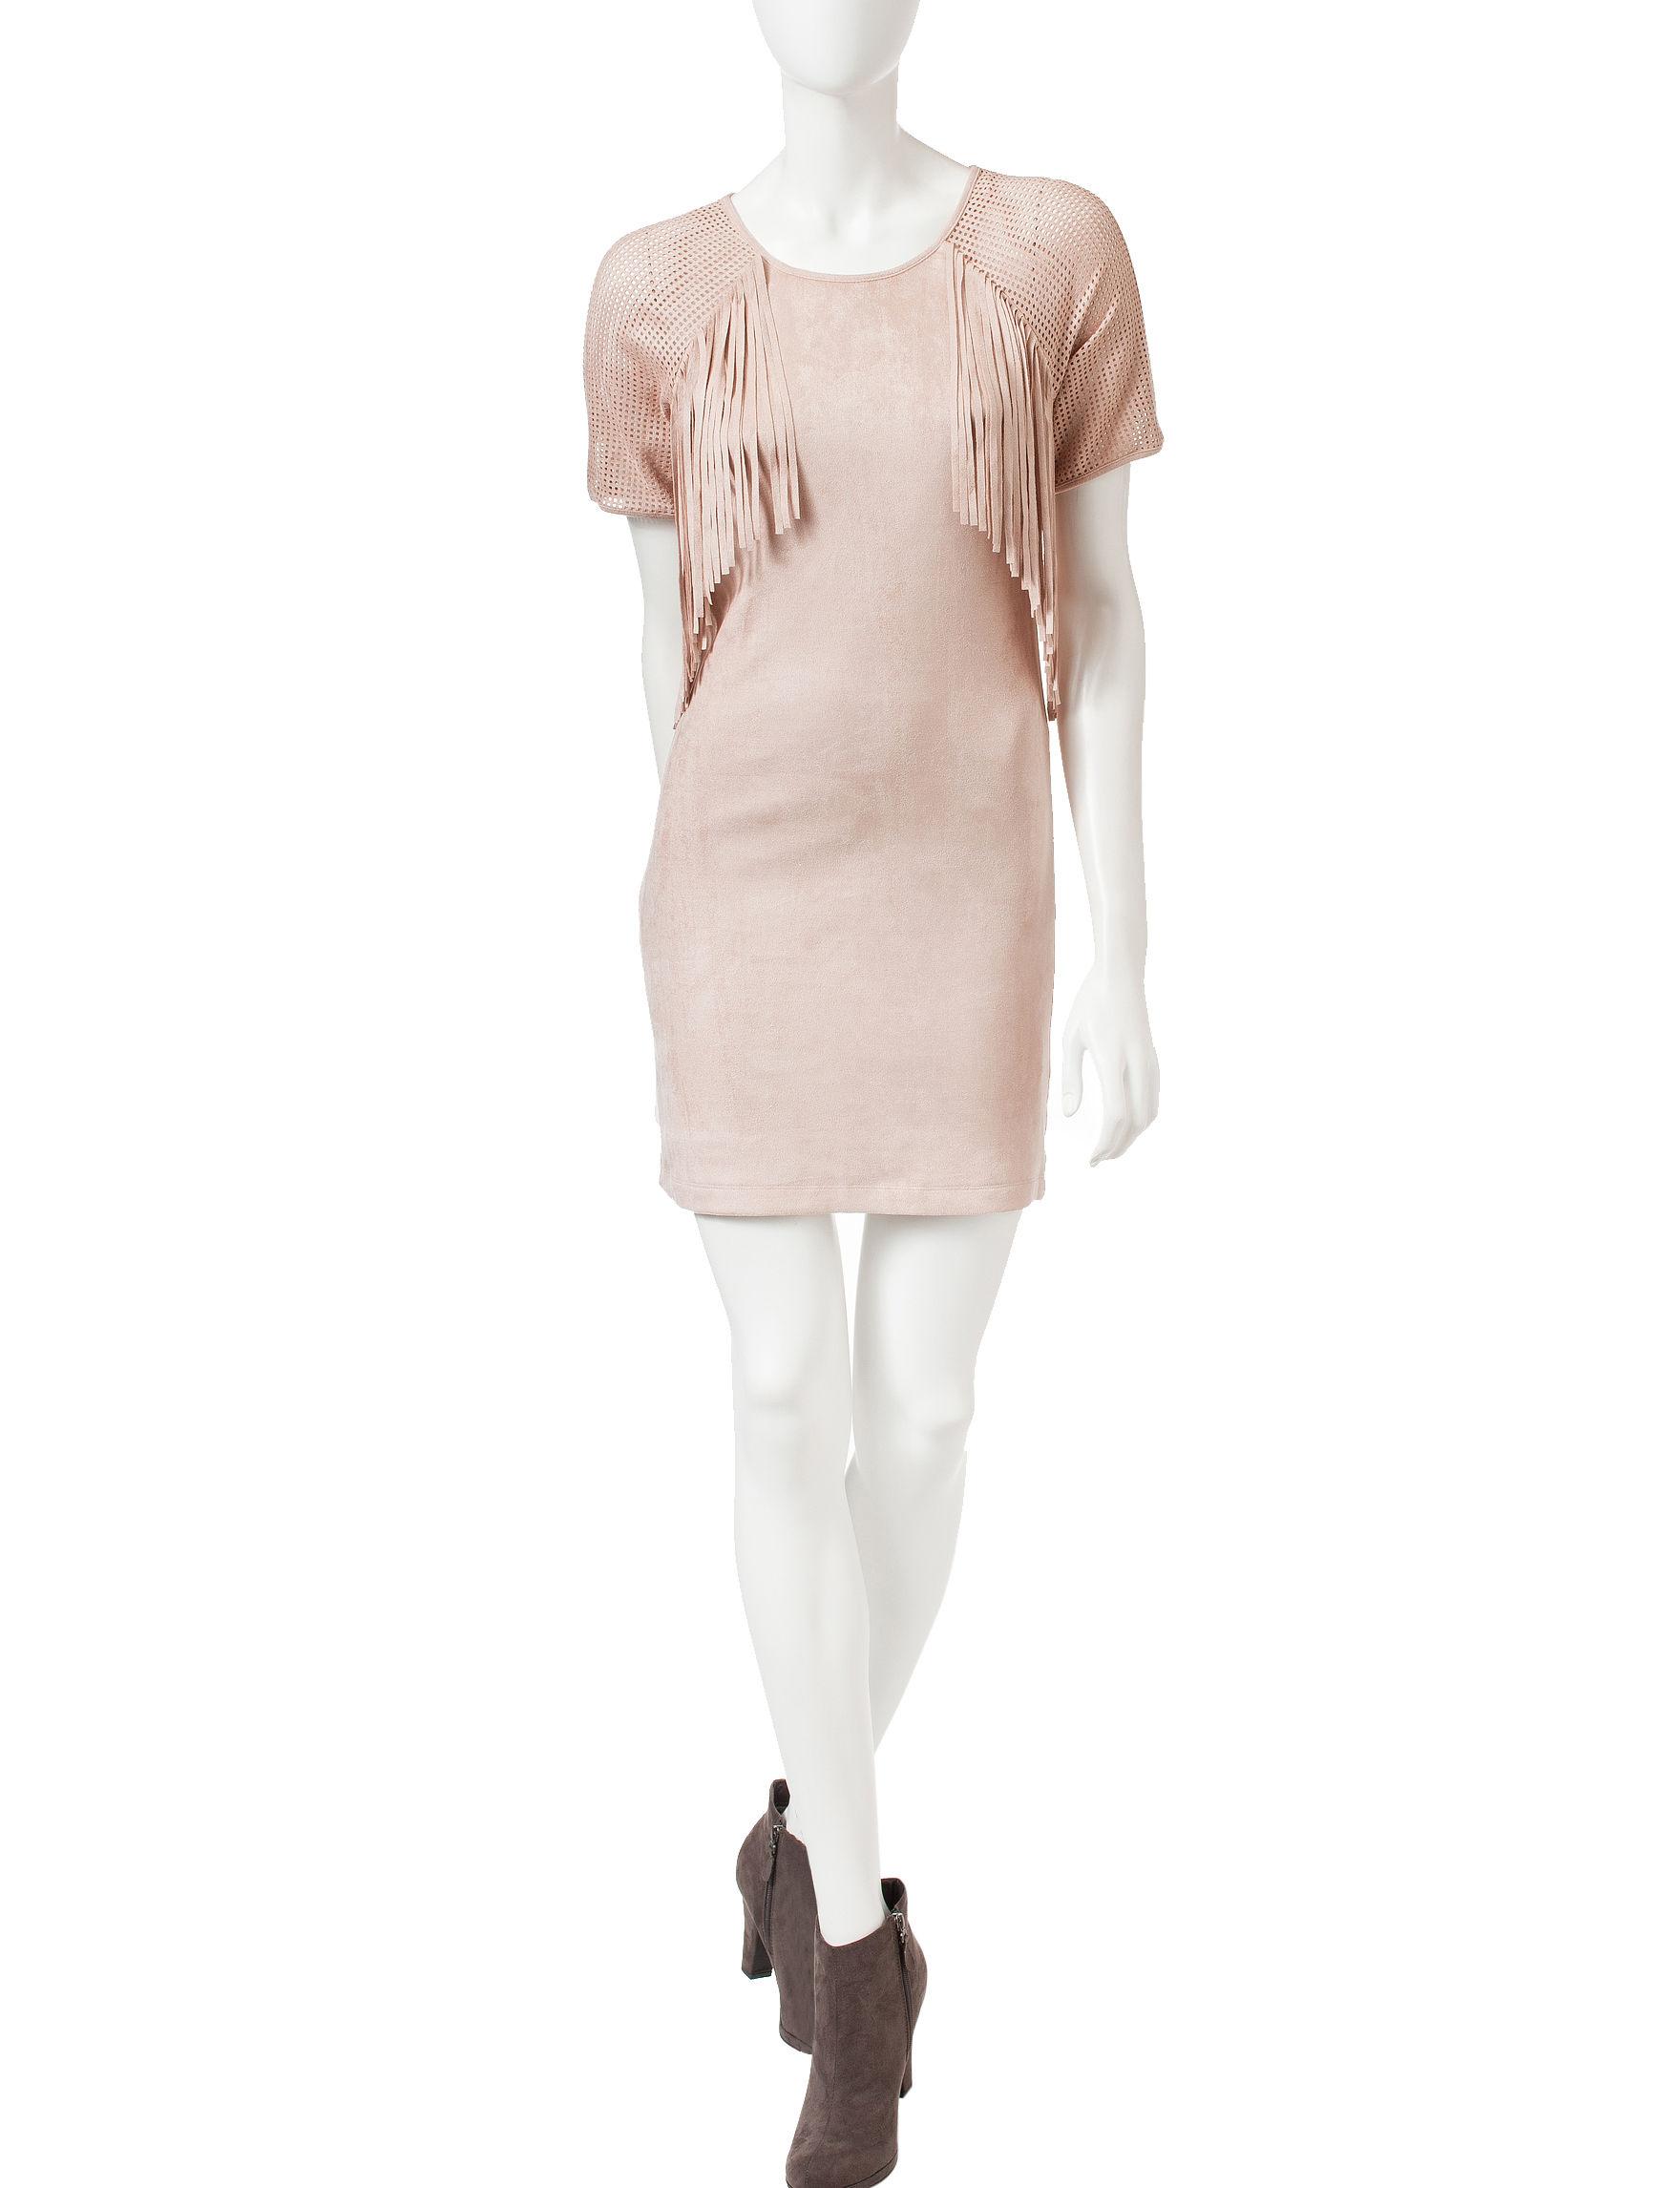 Romeo + Juliet Couture Blush Cocktail & Party Shift Dresses